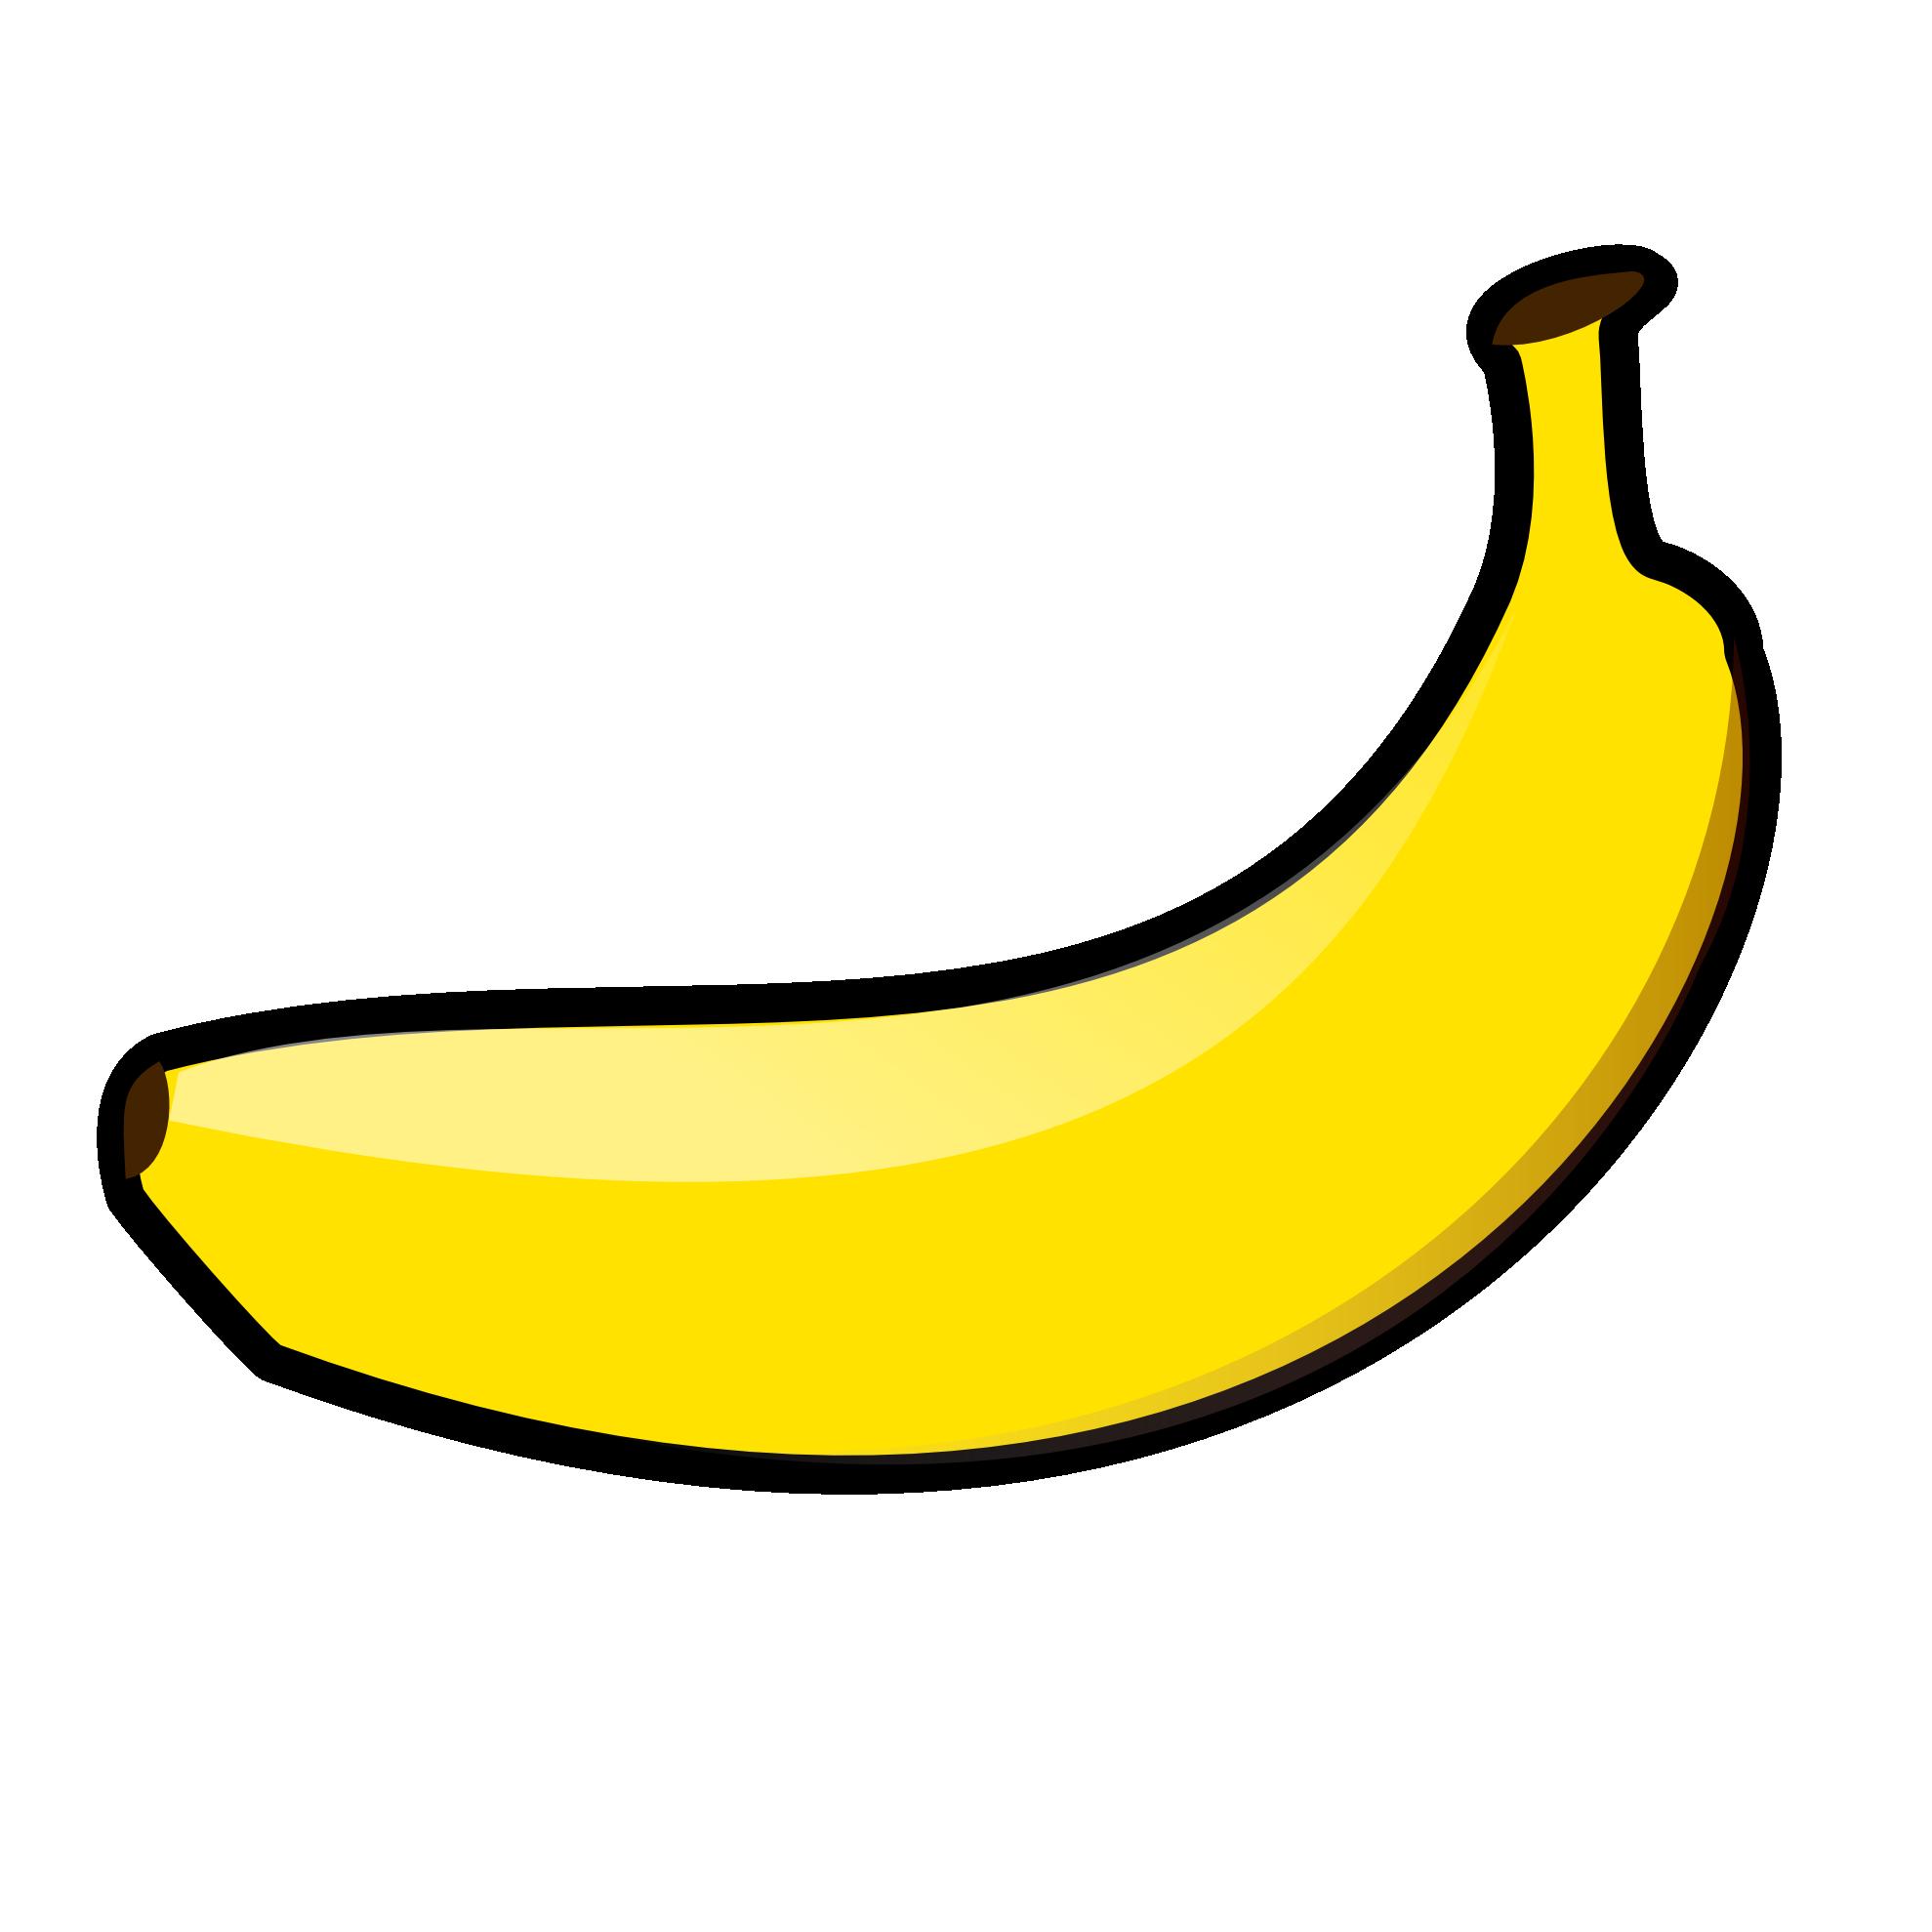 Banana clipart black.